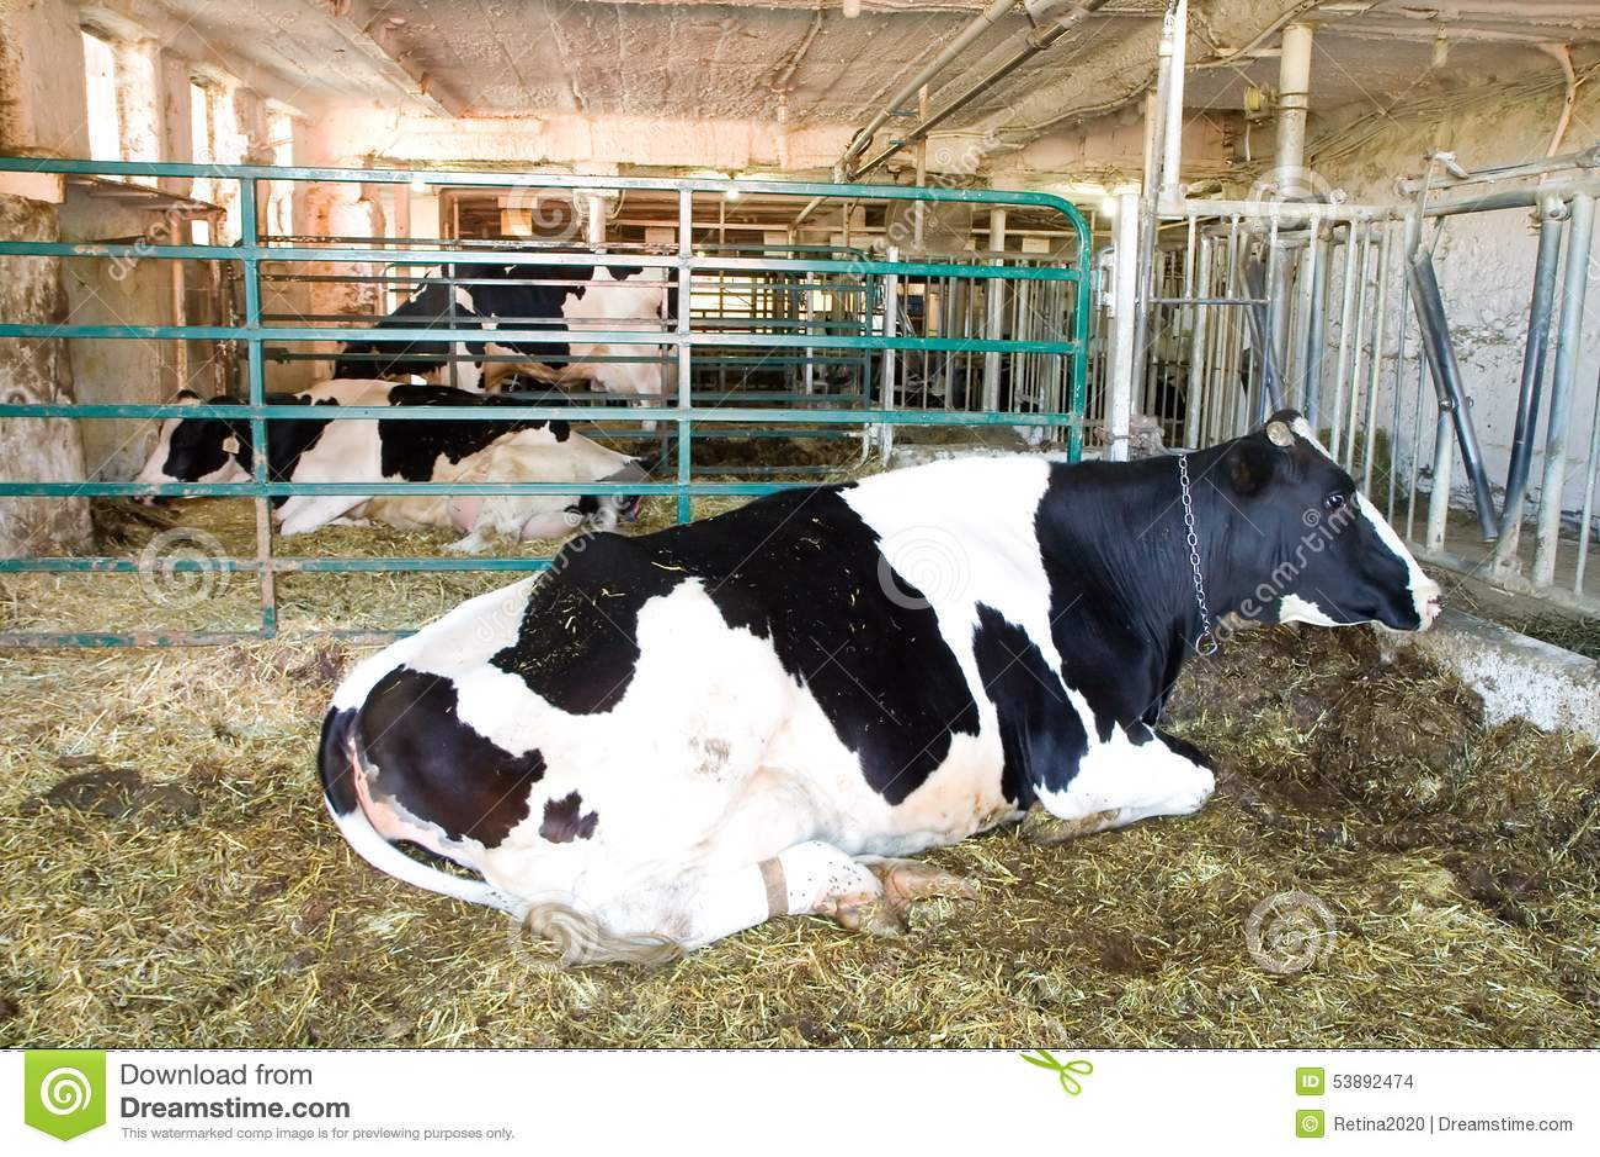 Dairy business plan